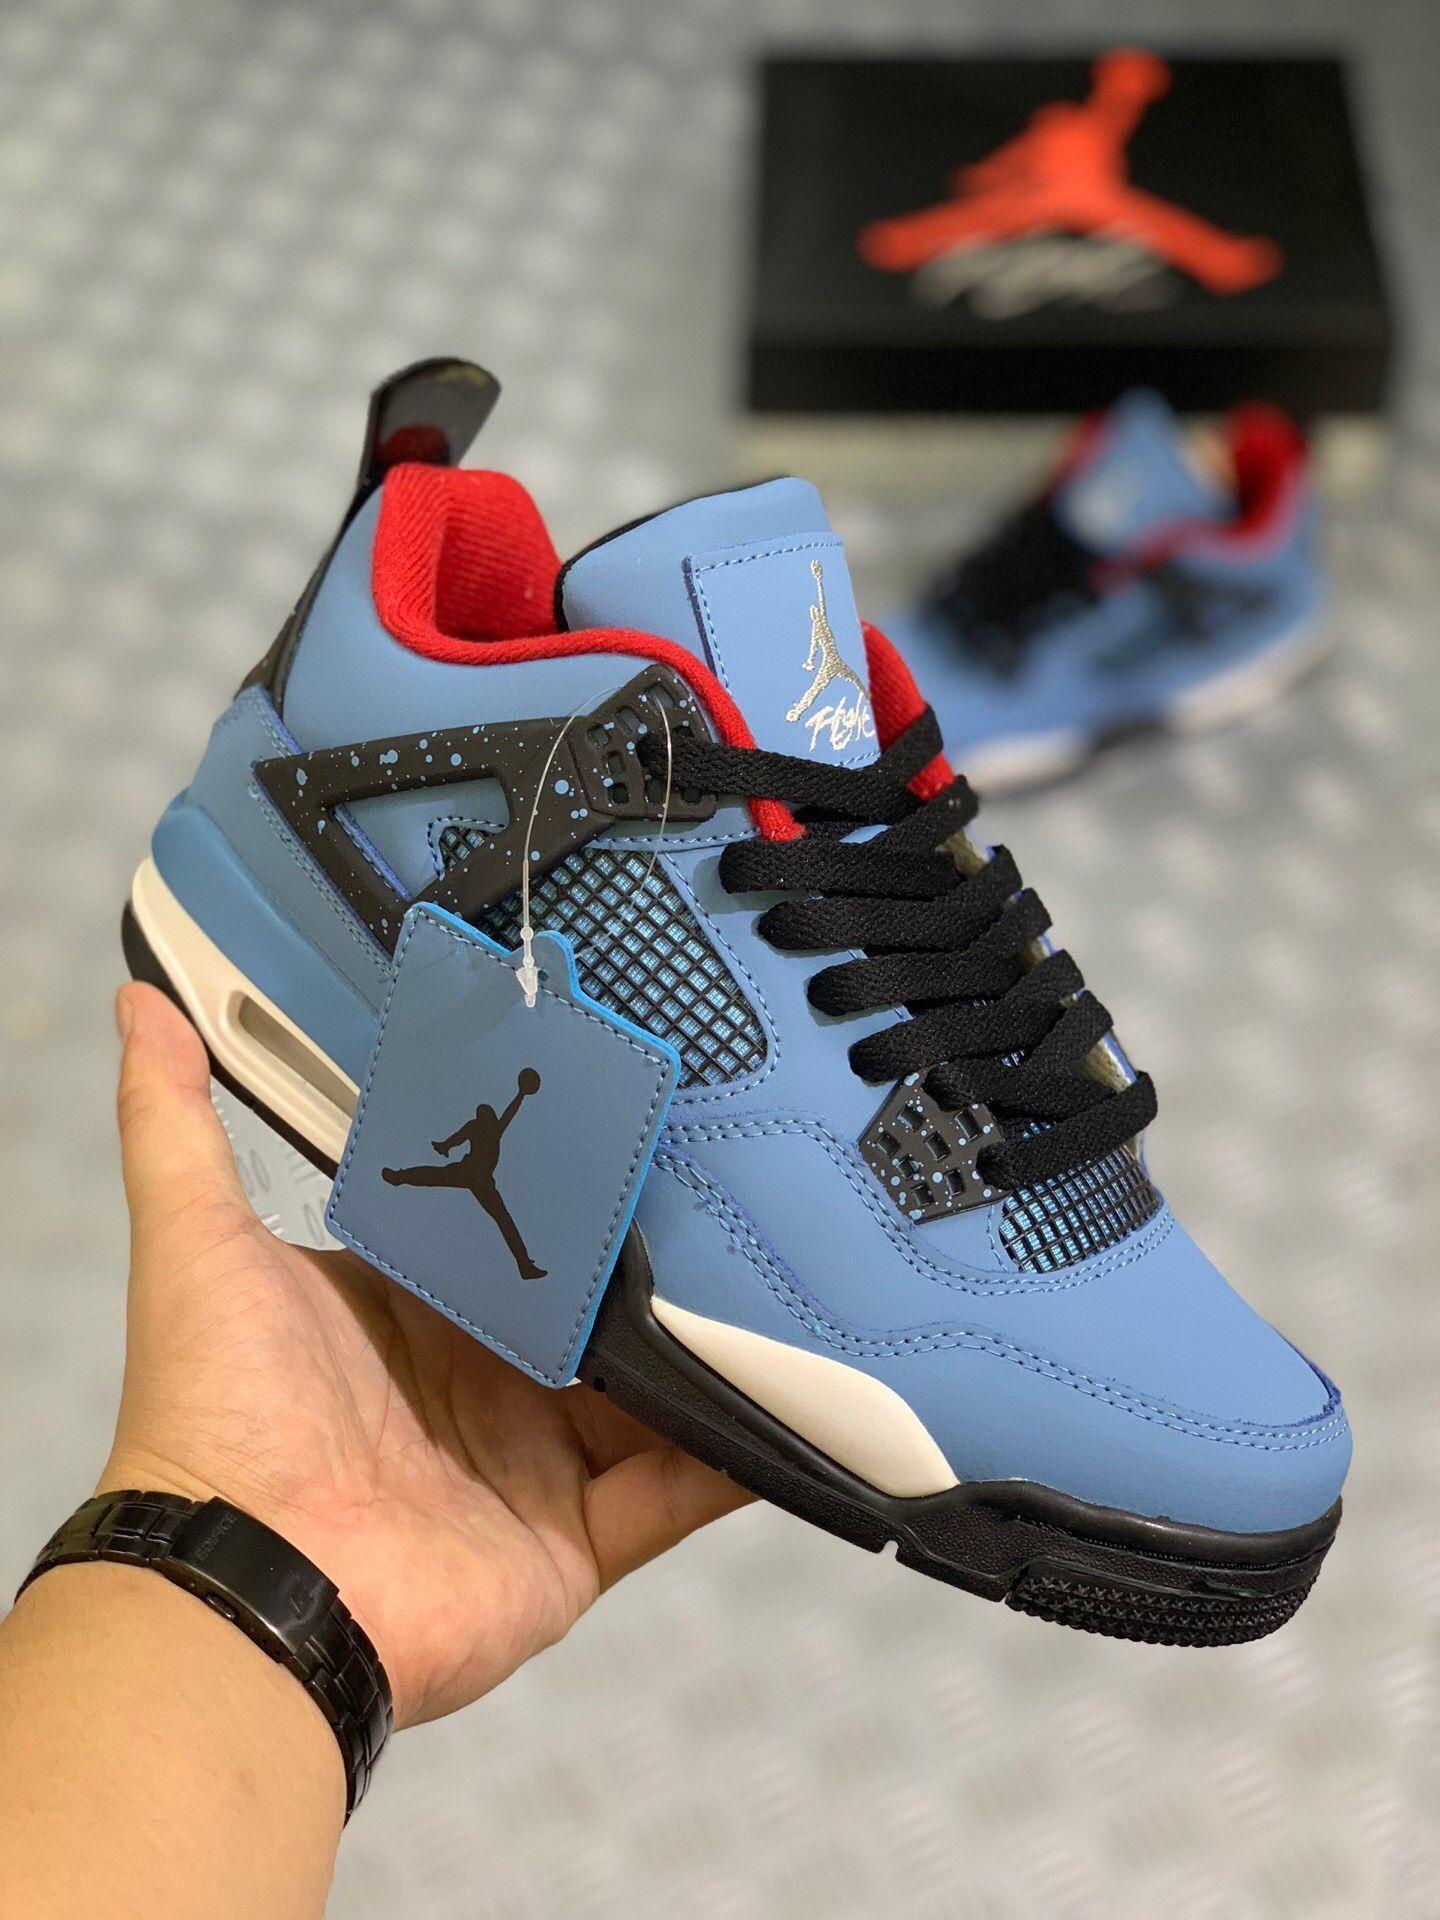 Travis Scott x Nike Air Jordan 4 Ice